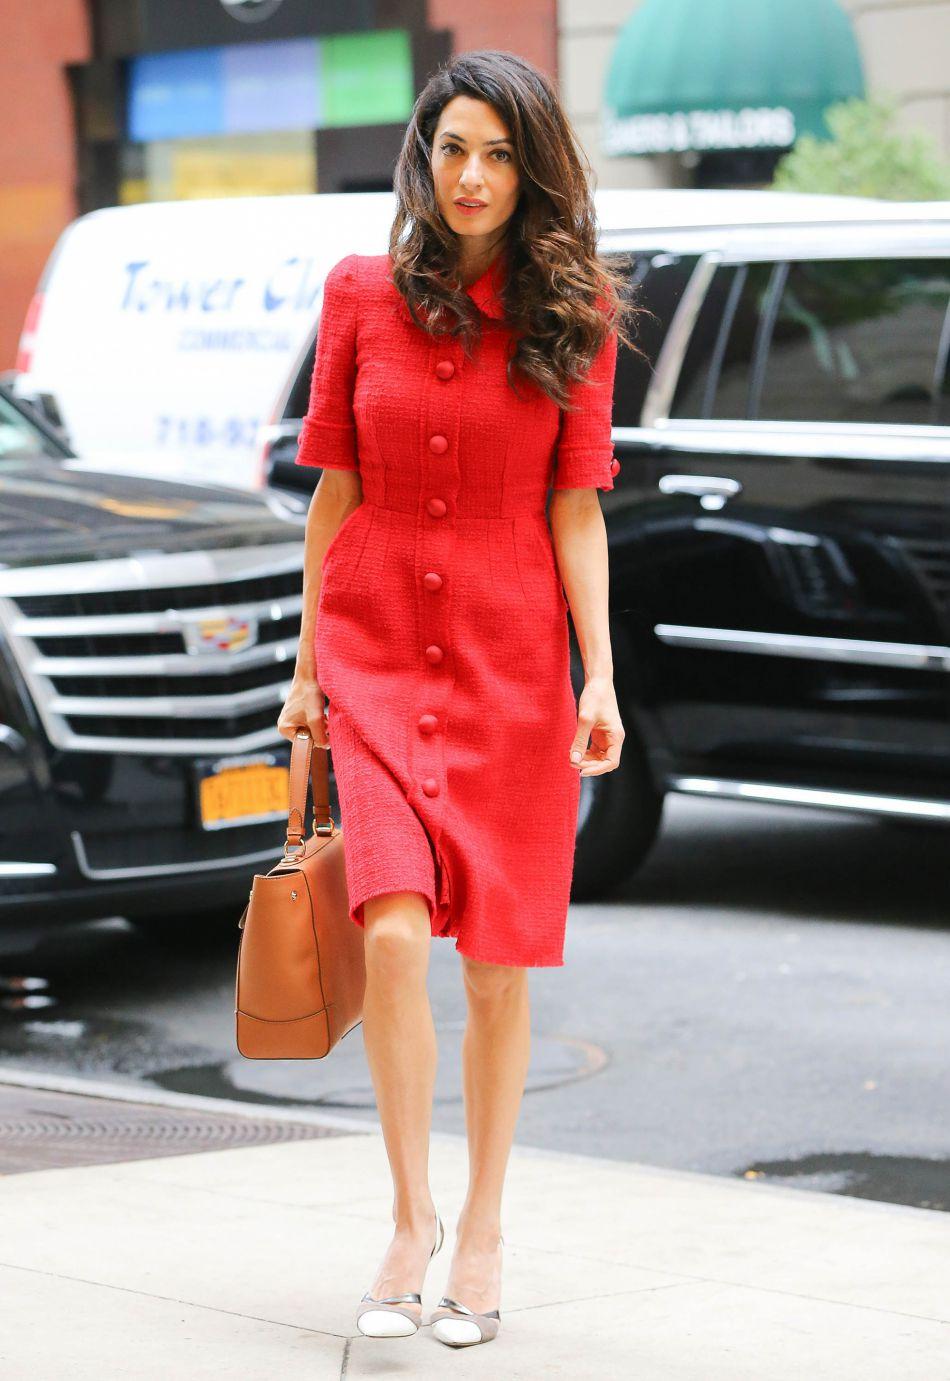 ae5a15f2f077 Sublime et chic dans sa robe Dolce  amp  Gabbana